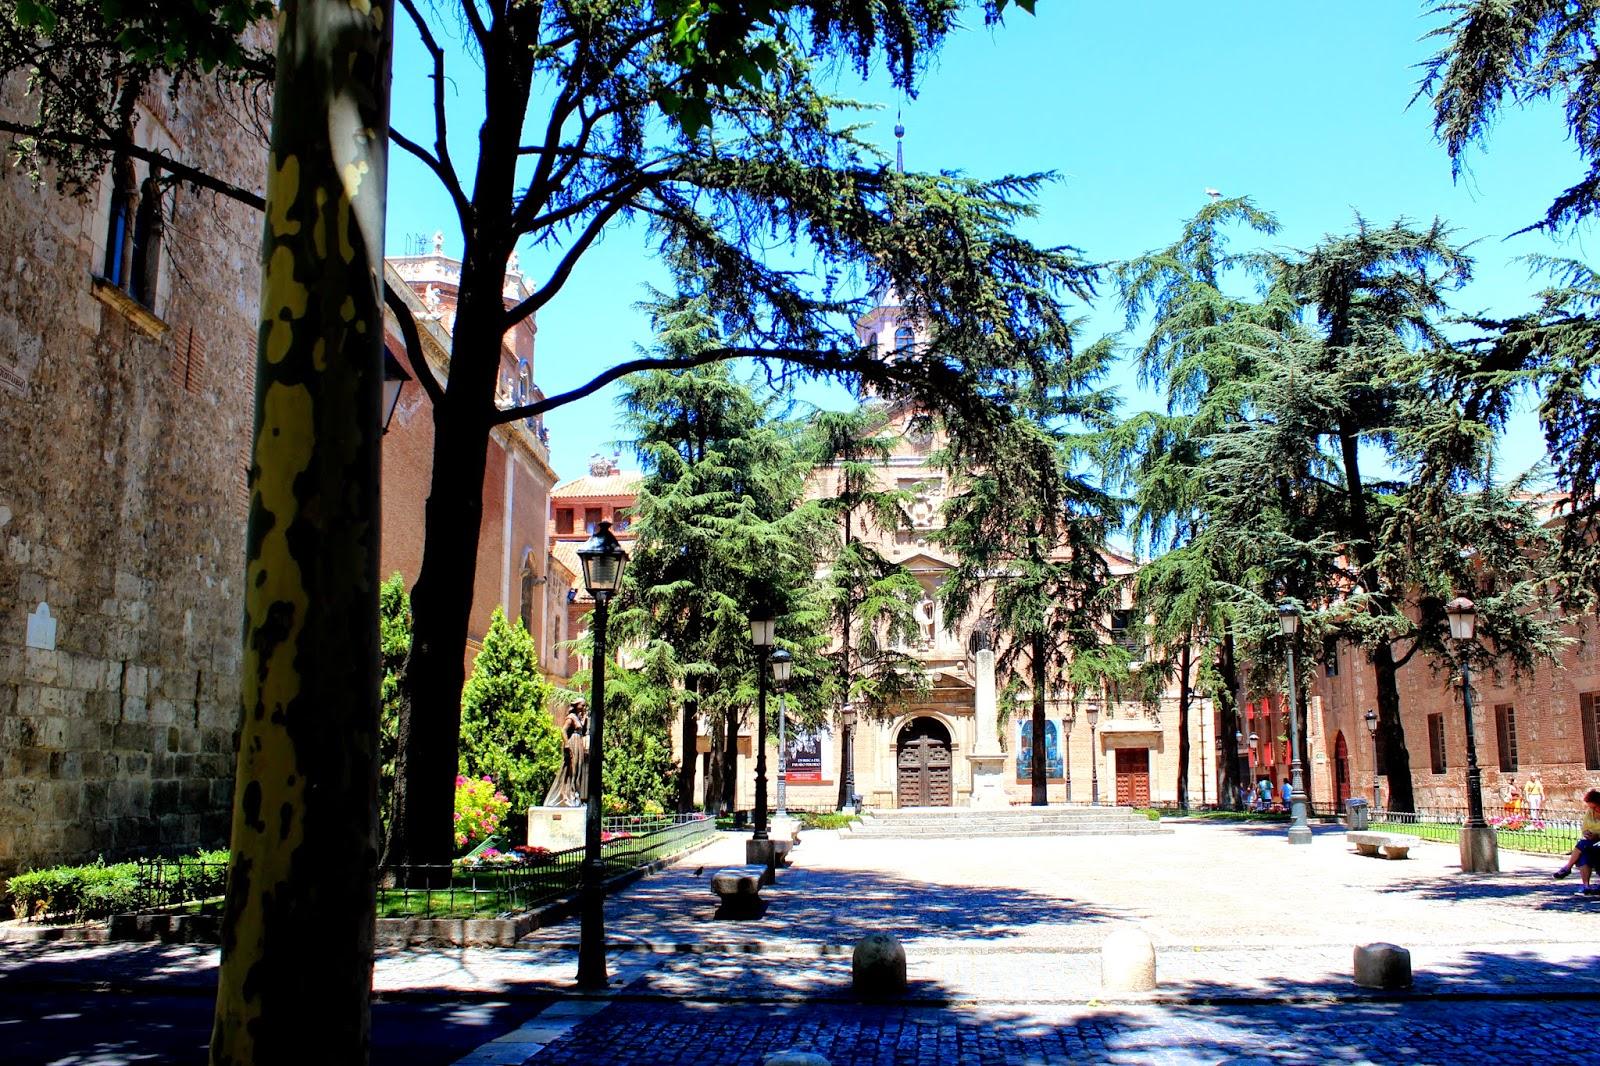 Monasterio de San Bernardo en Alcalá de Henares